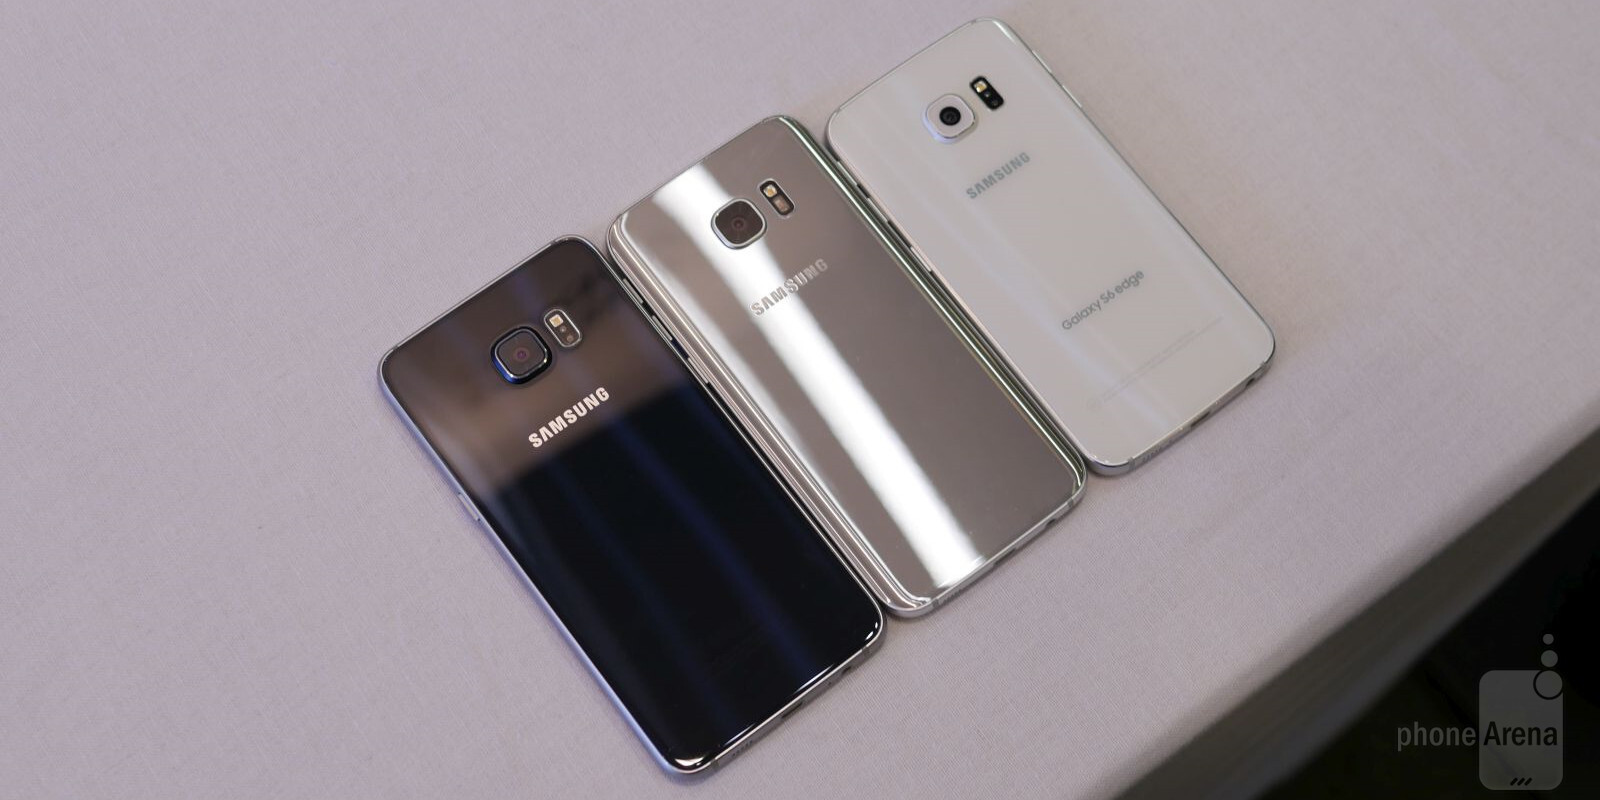 Samsung Galaxy S7 edge vs Samsung Galaxy S6 edge vs Samsung Galaxy S6 ...